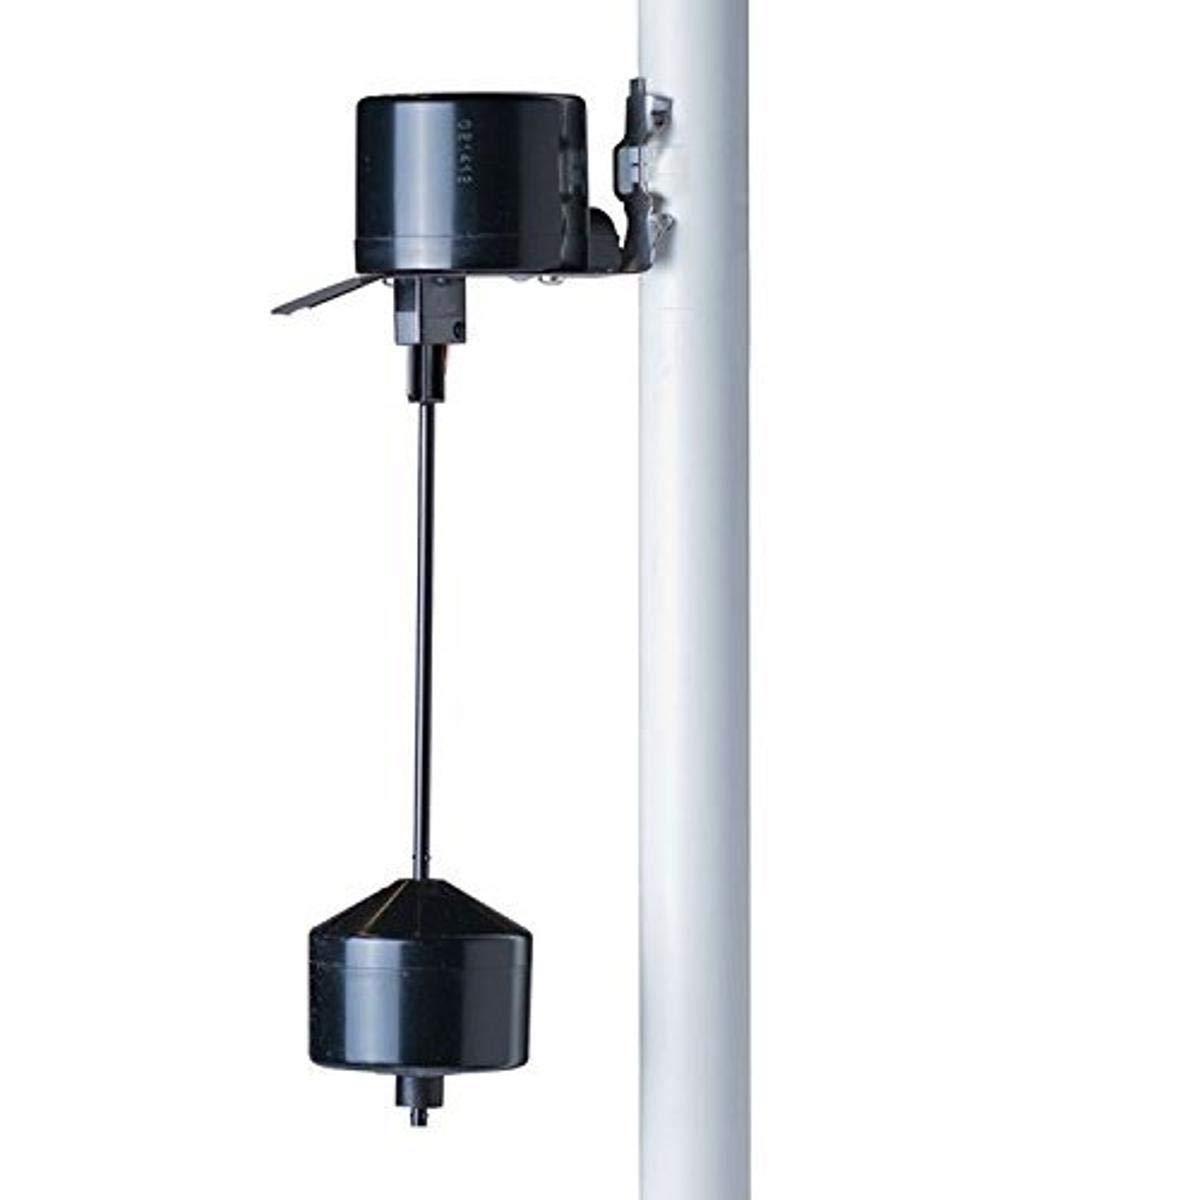 SJE Rhombus 1003771 SJE Vertical Master Pump Switch 30', 120VAC with Plug